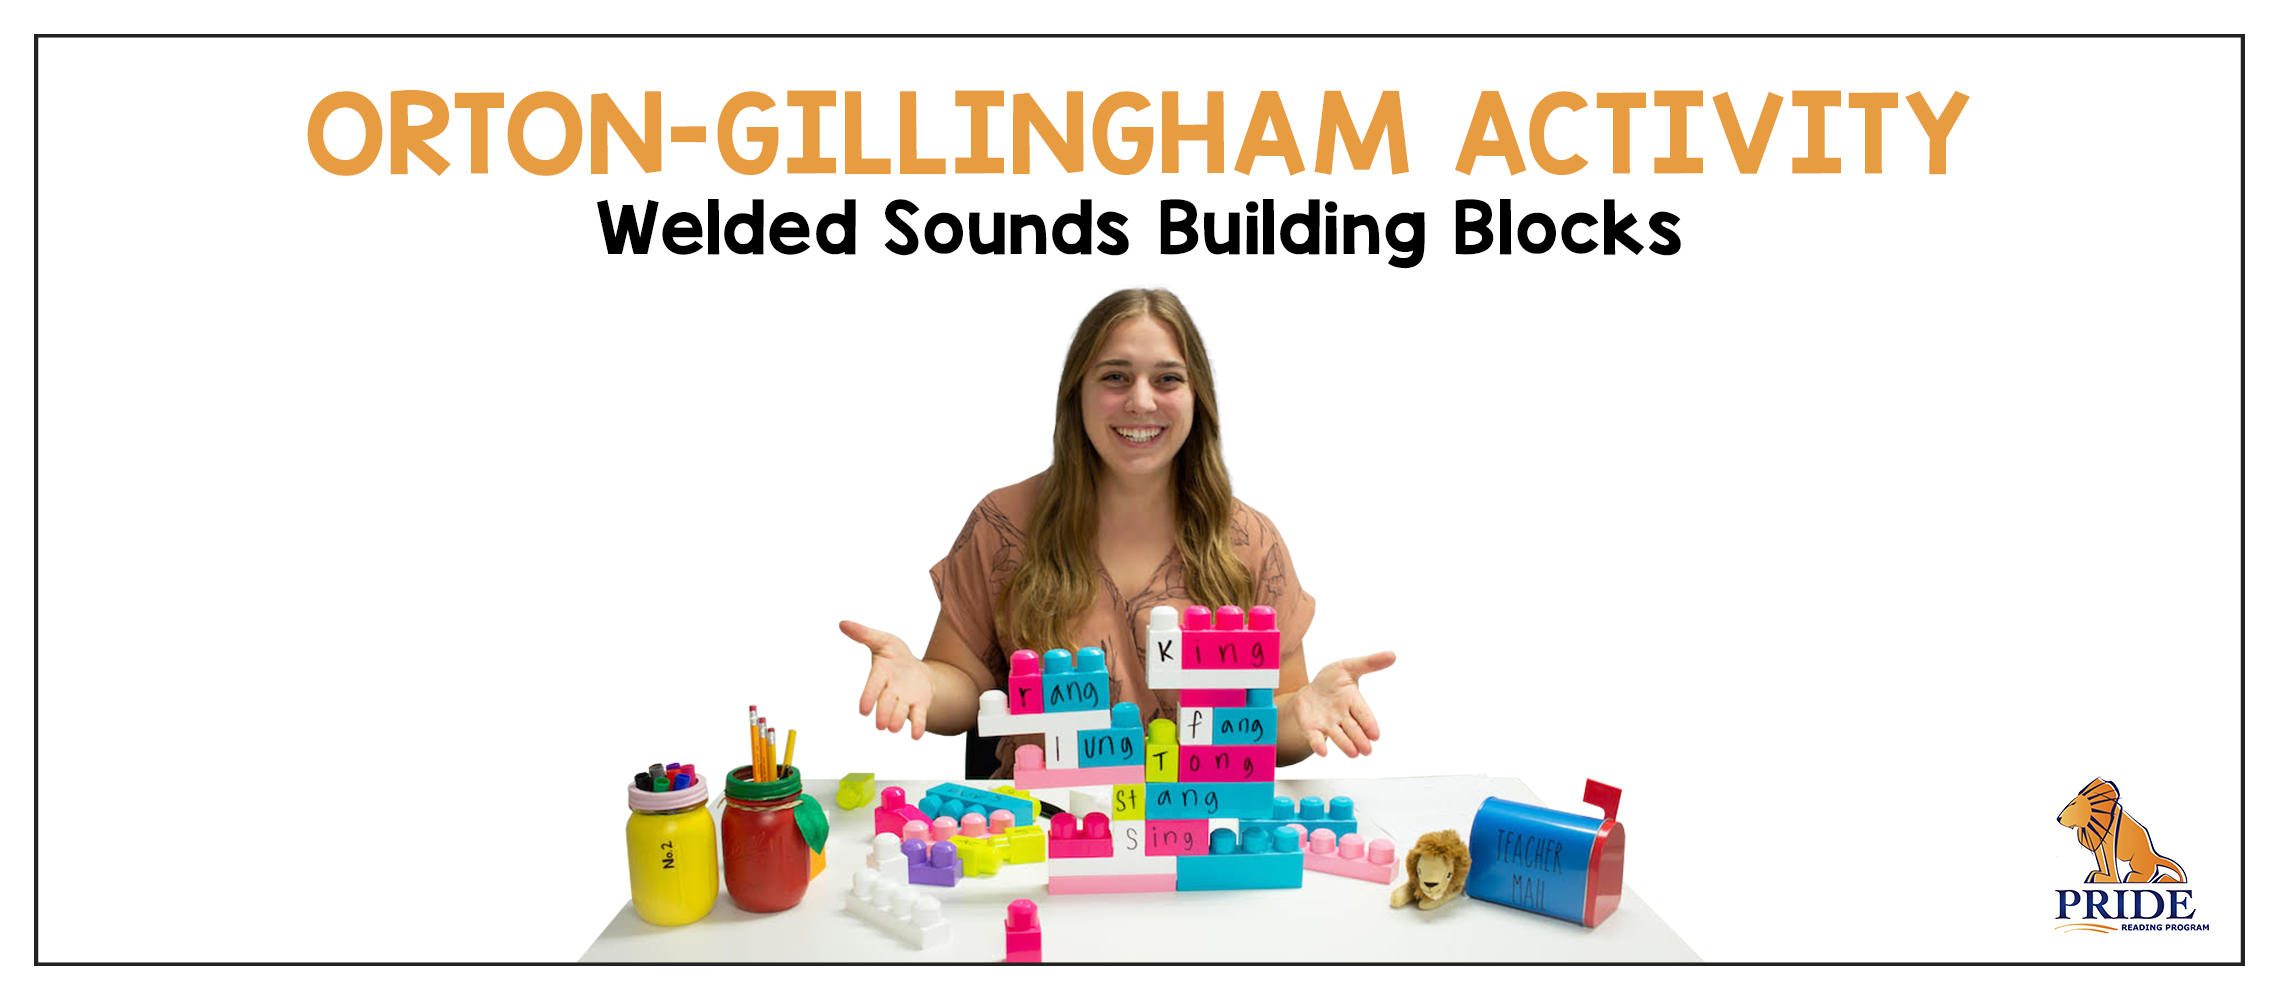 Orton Gillingham Activity Welded Sounds Building Blocks